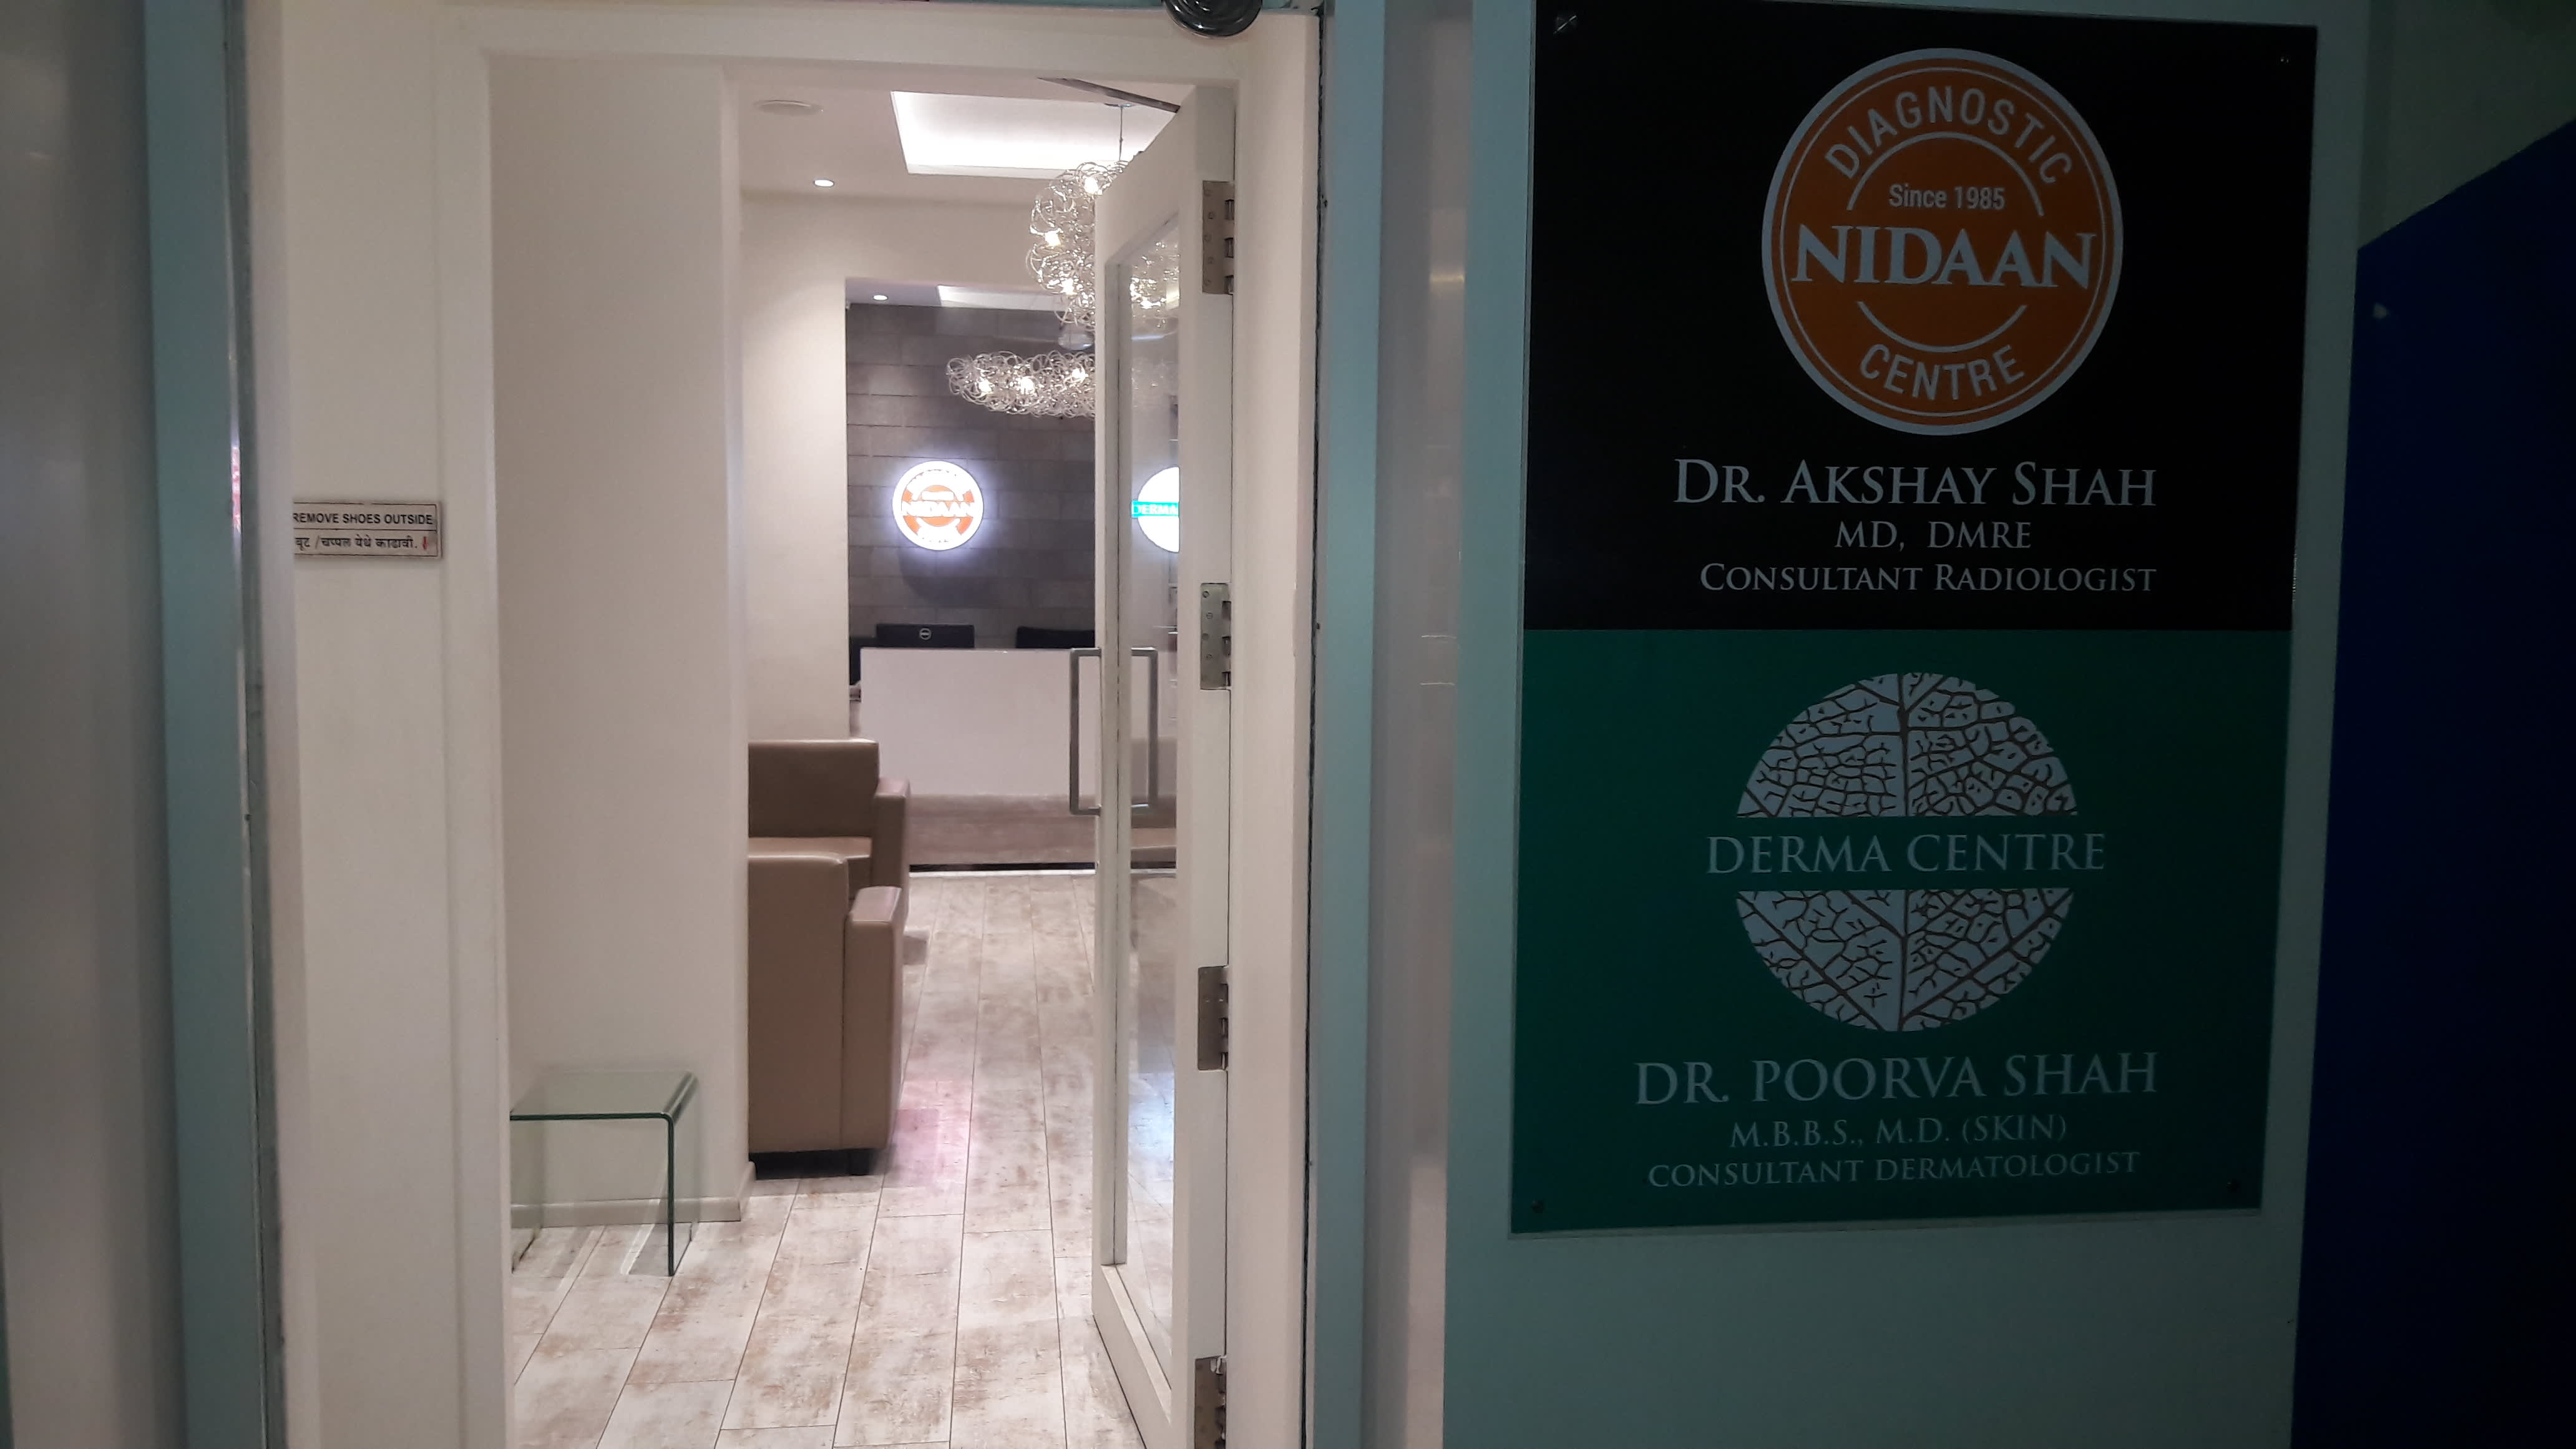 Dermatologist in Pune - Best Skin Specialist Doctor - Top List